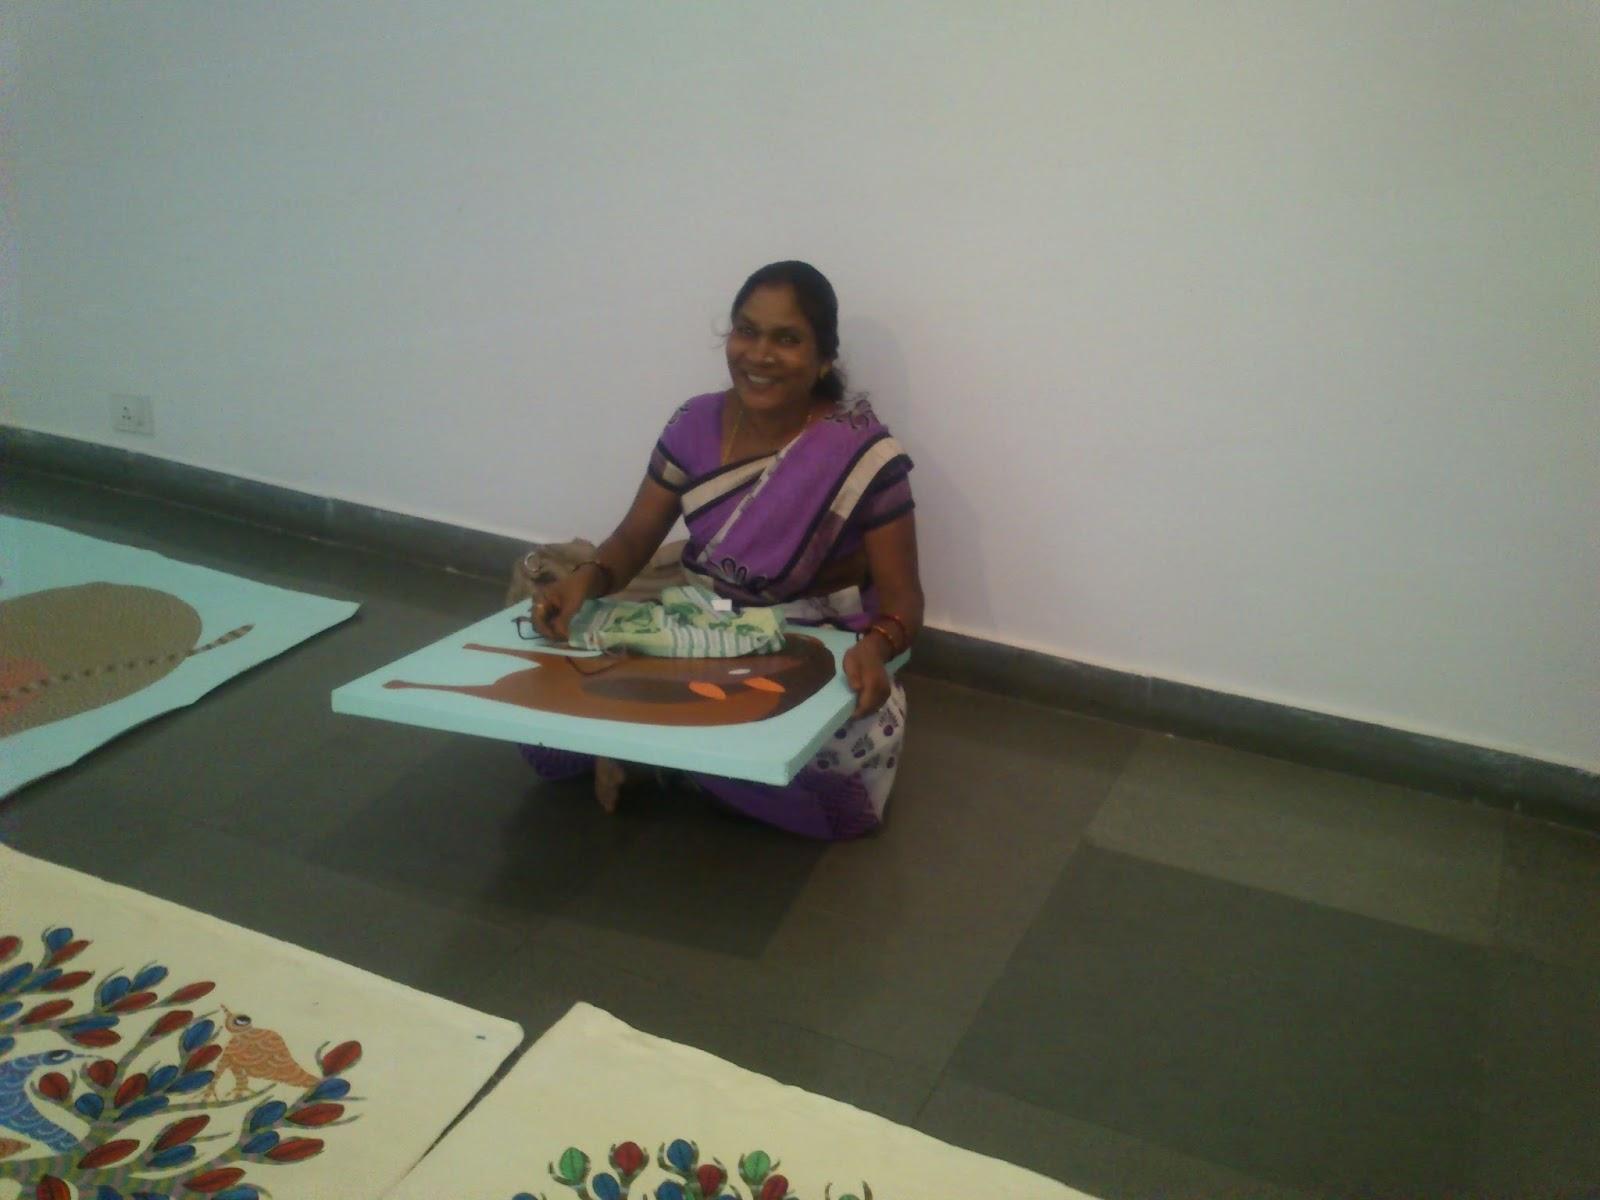 Image by Nalini Malaviya